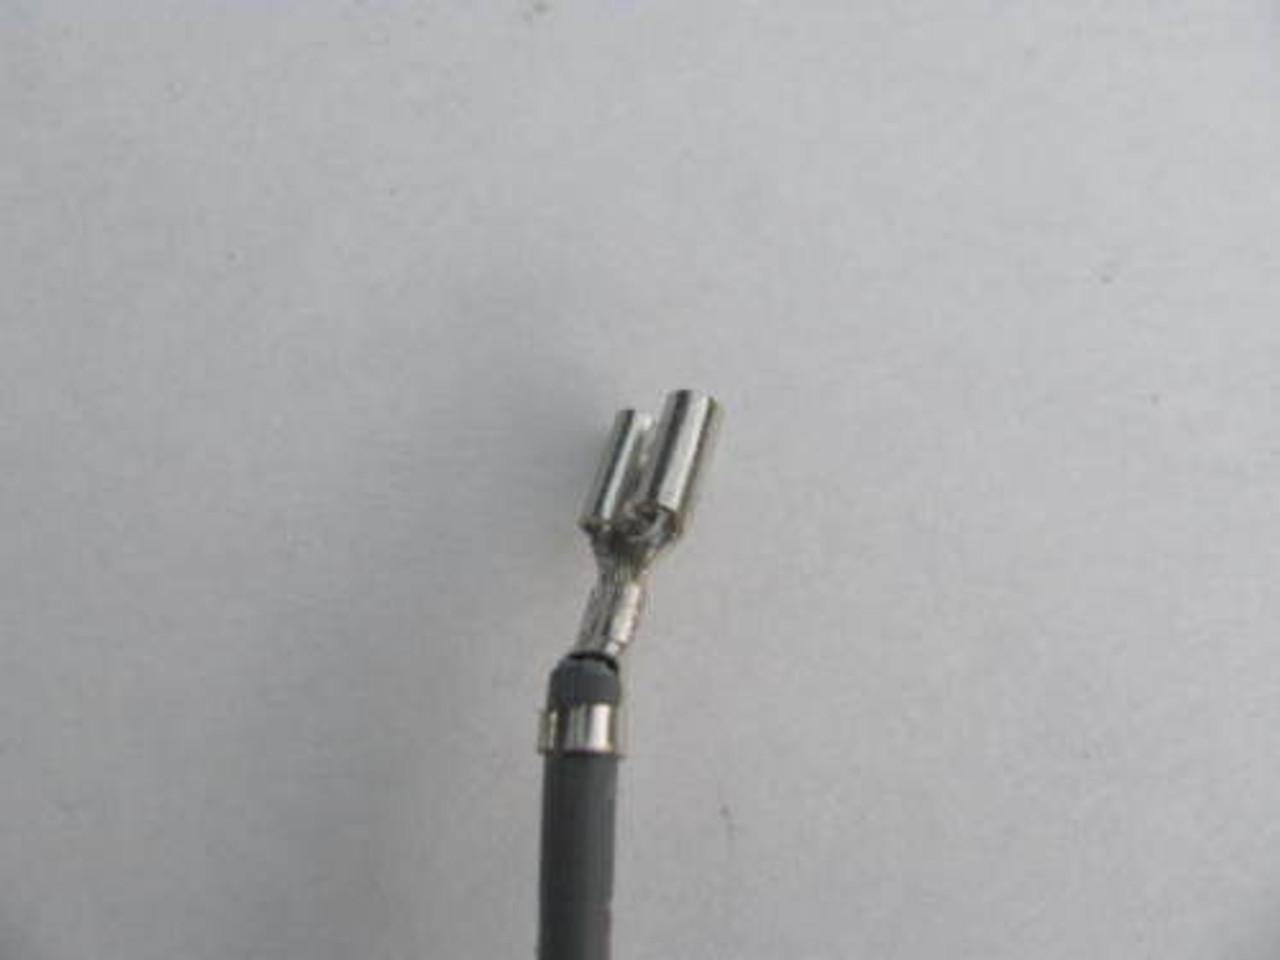 Upgraded Wiring - VW Beetle Headlight Harness - 1C0971671 (AAR1083)